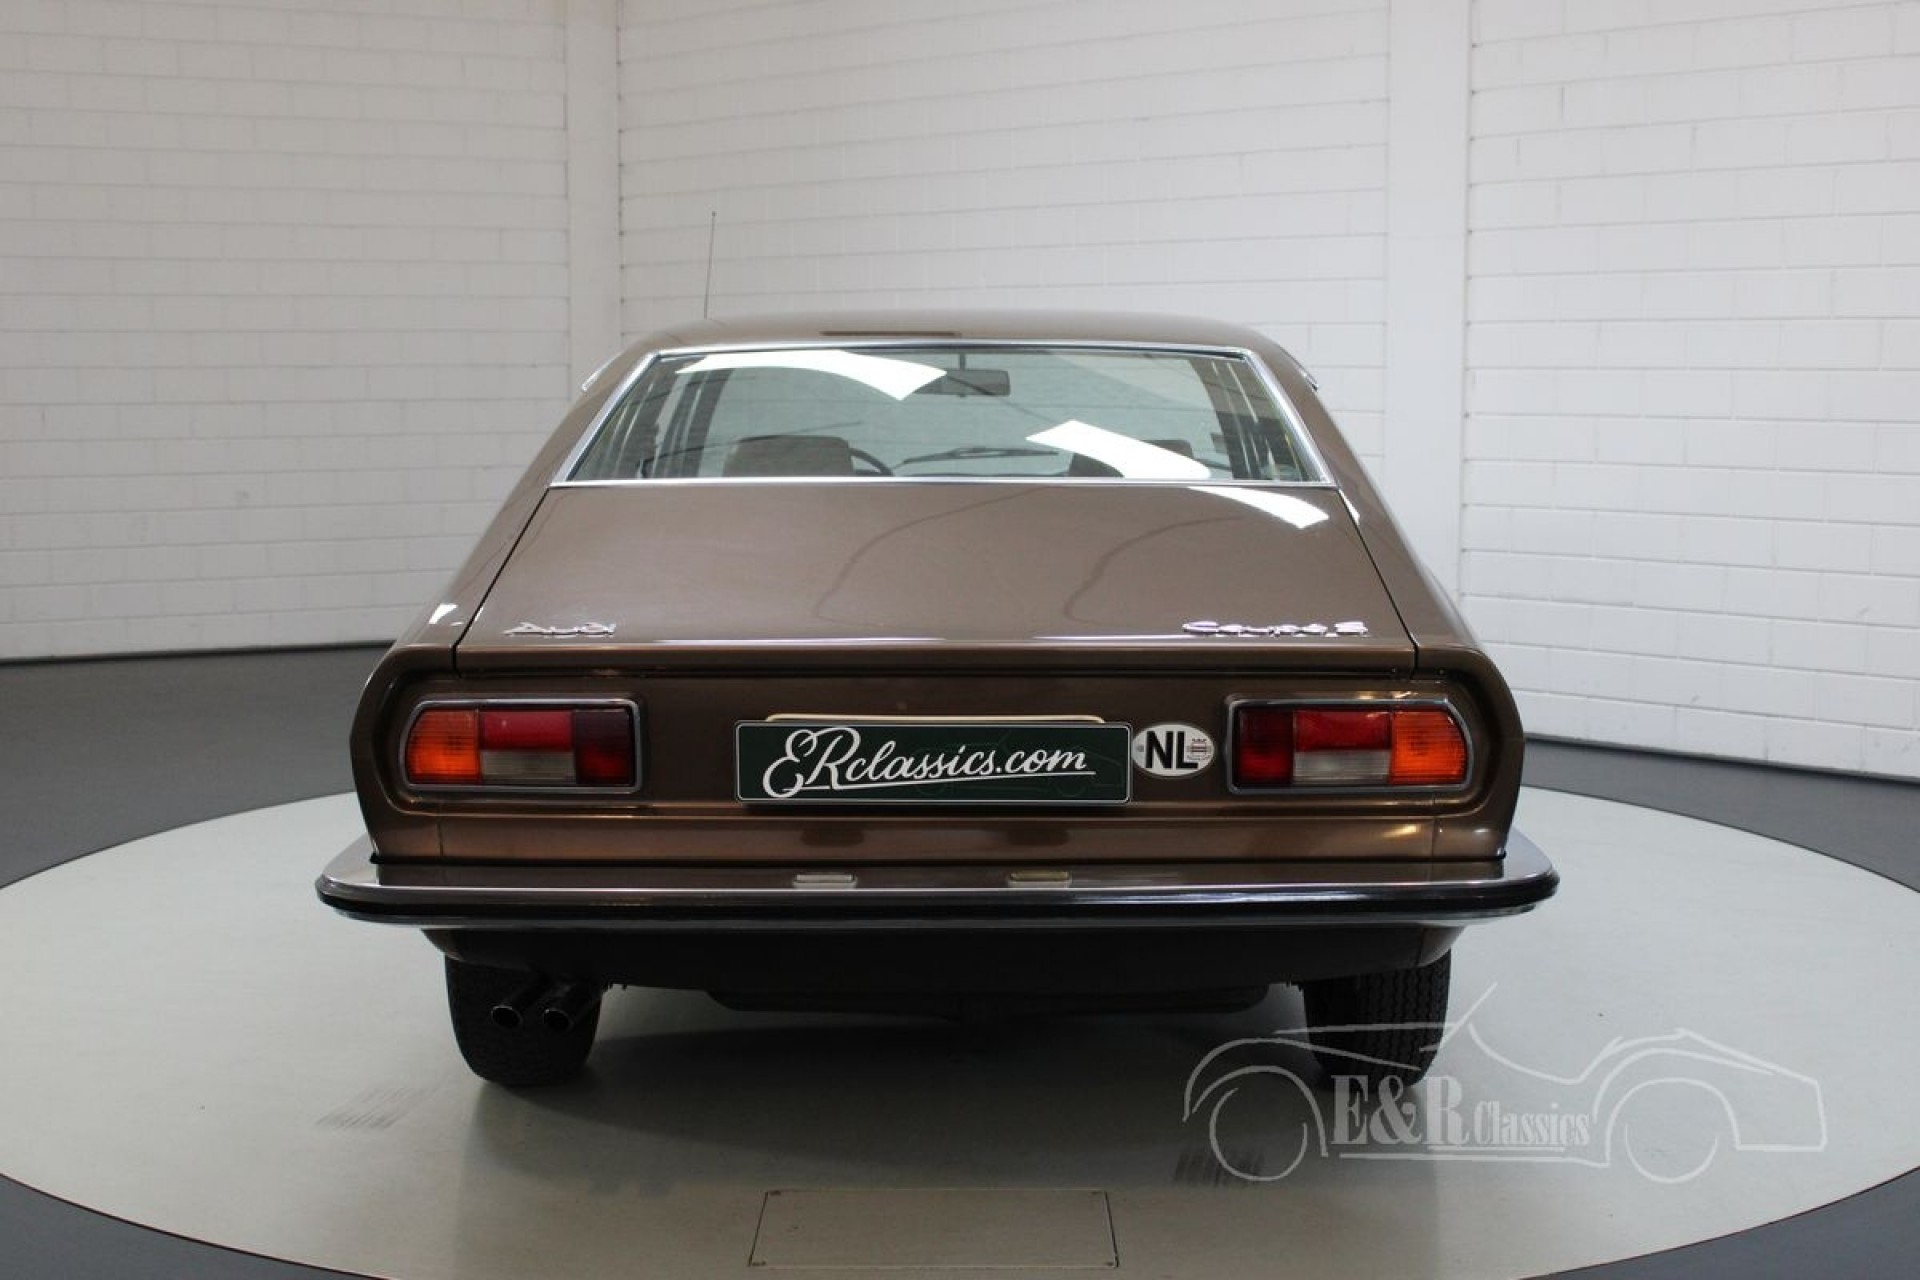 Audi 100 Coupe 1973 erclassics com auto-union-audi-100-coupe-1973-a5947-047